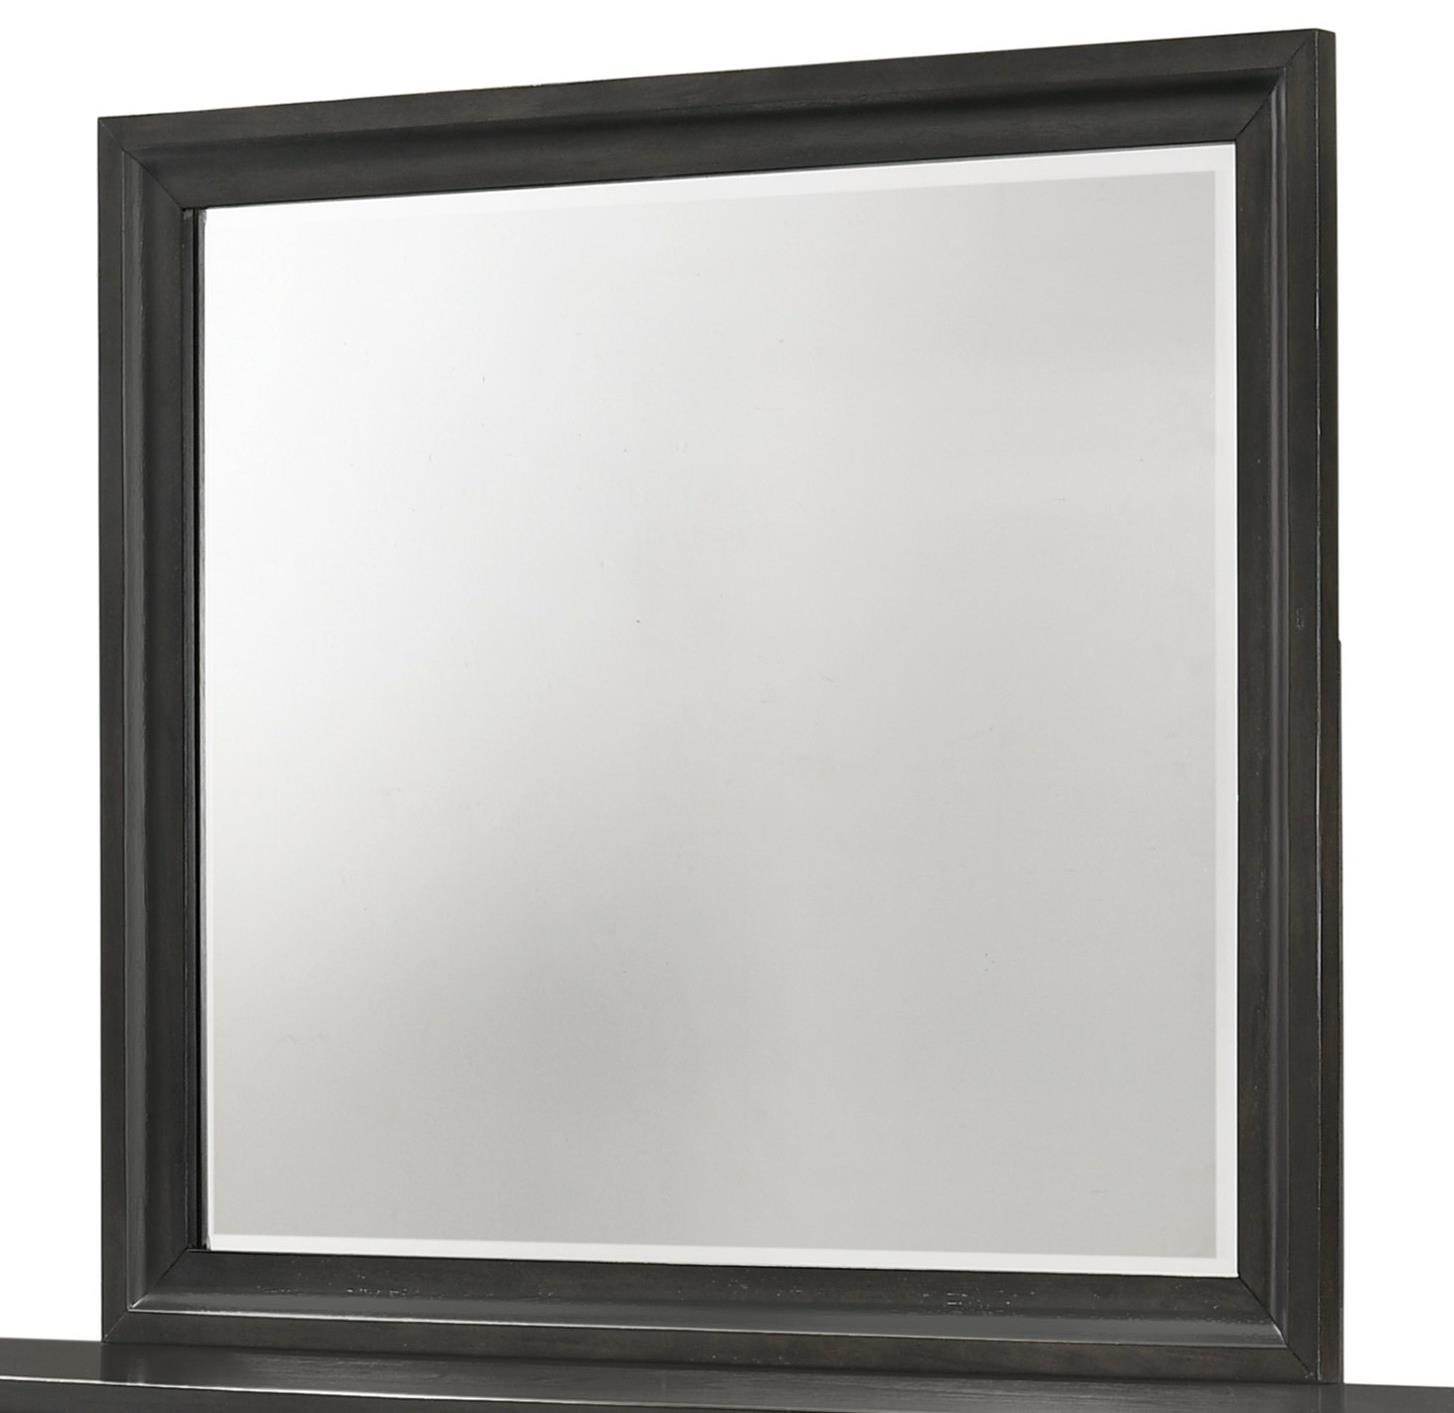 Aria Dresser Mirror by Lane at Household Furniture